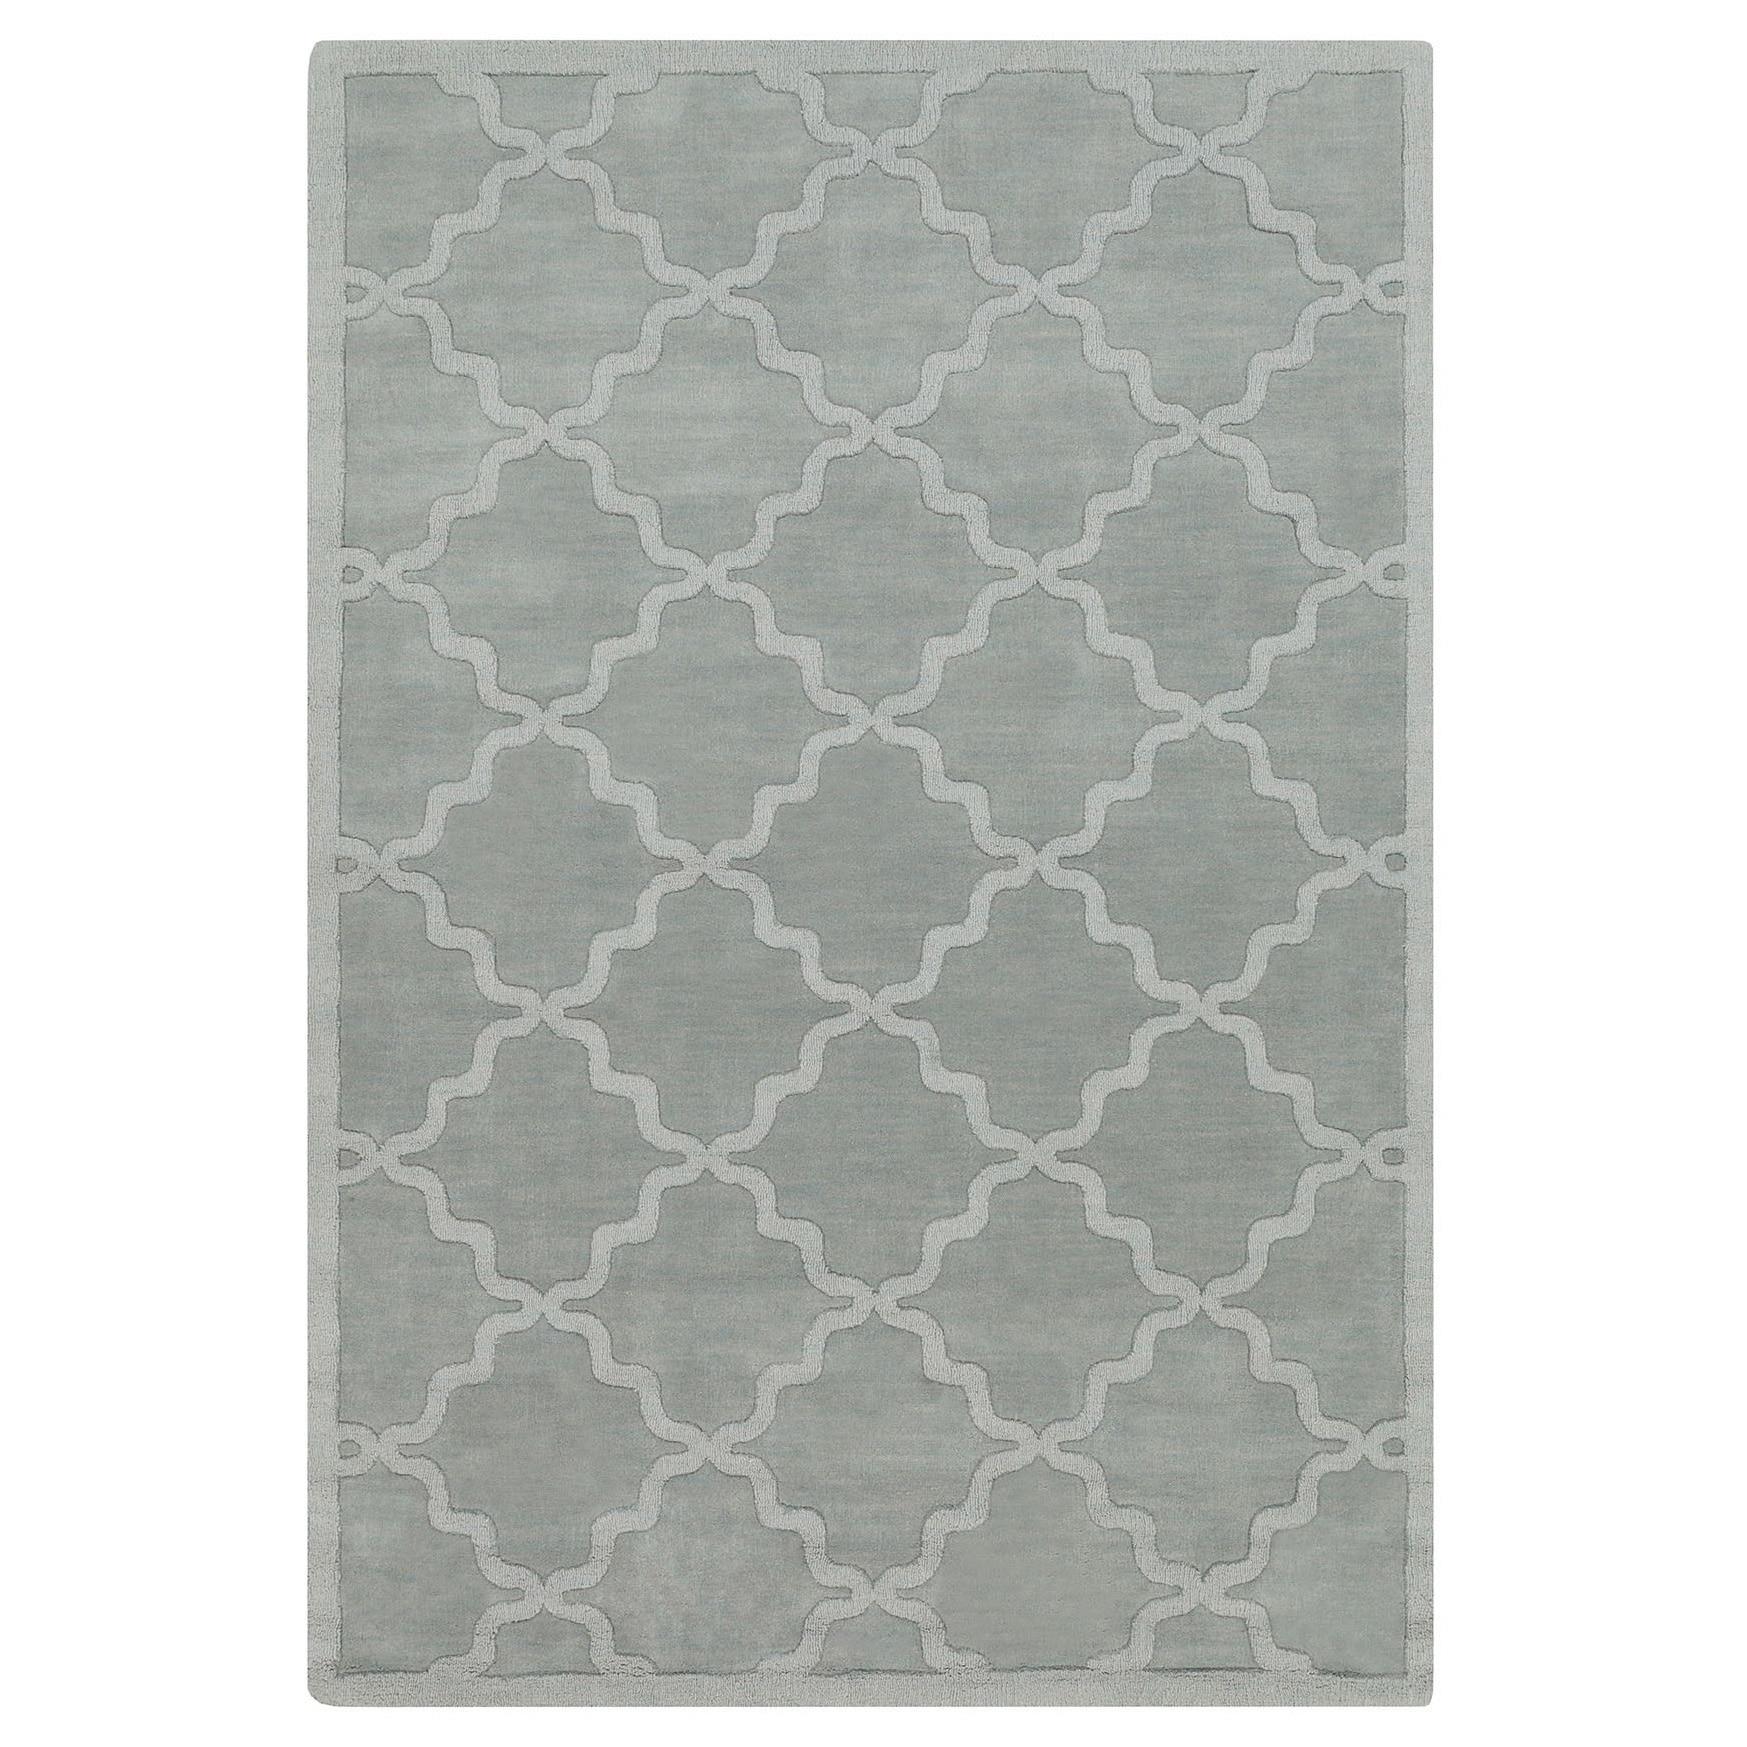 The Gray Barn Margoyles Hand-woven Tone-on-Tone Lattice Wool Rug - 8' x 10'